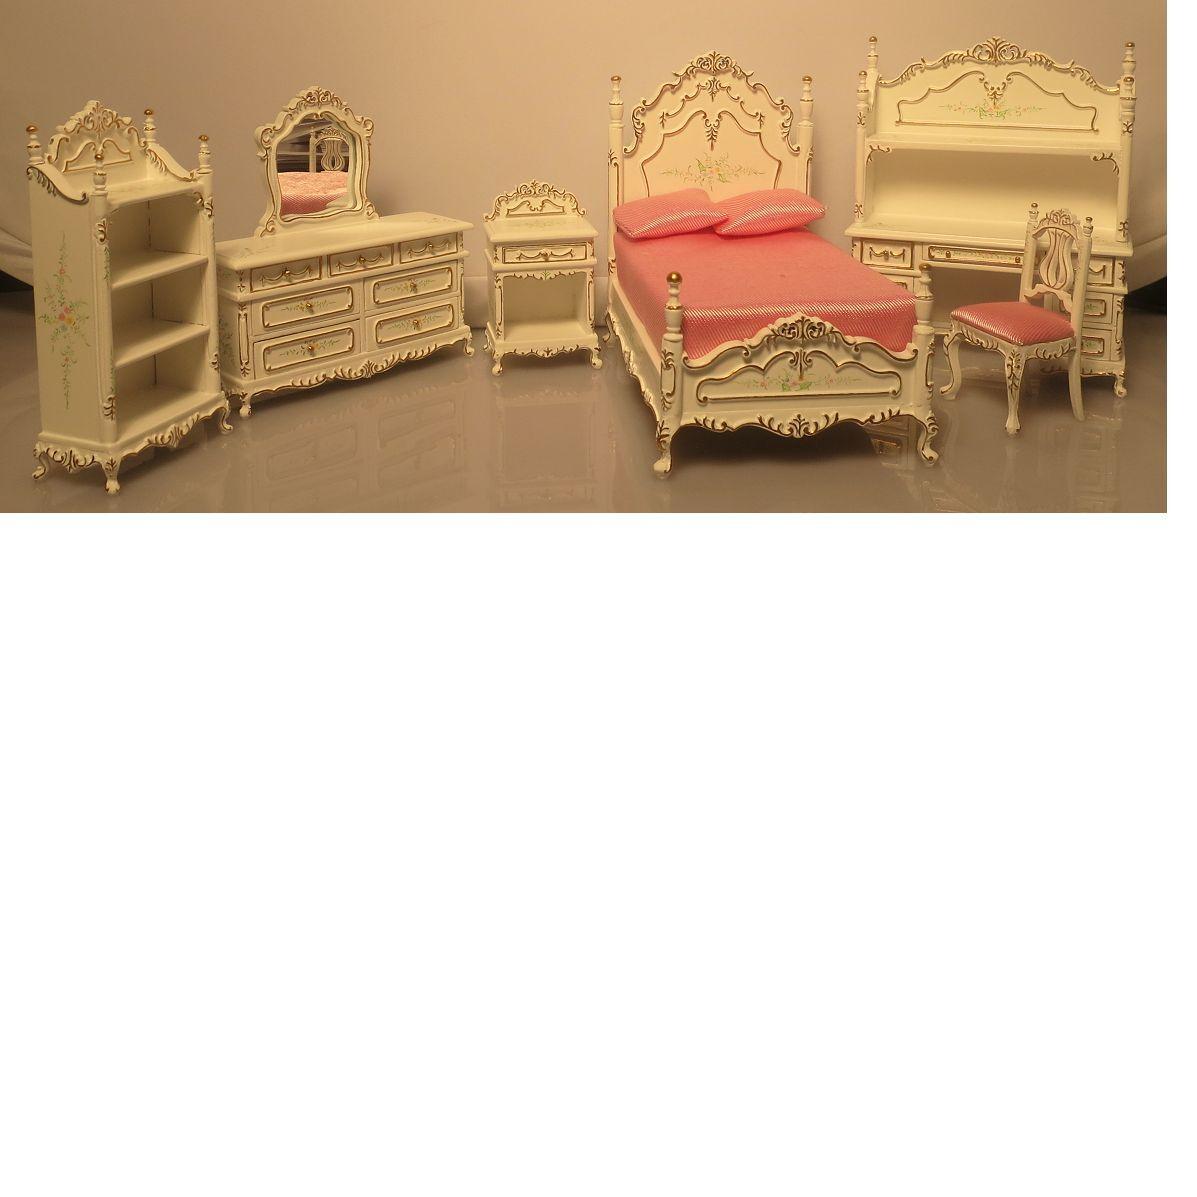 Bespaq Dollhouse Miniature Youth Kid Girl's Bedroom Furniture Set Bed Desk New